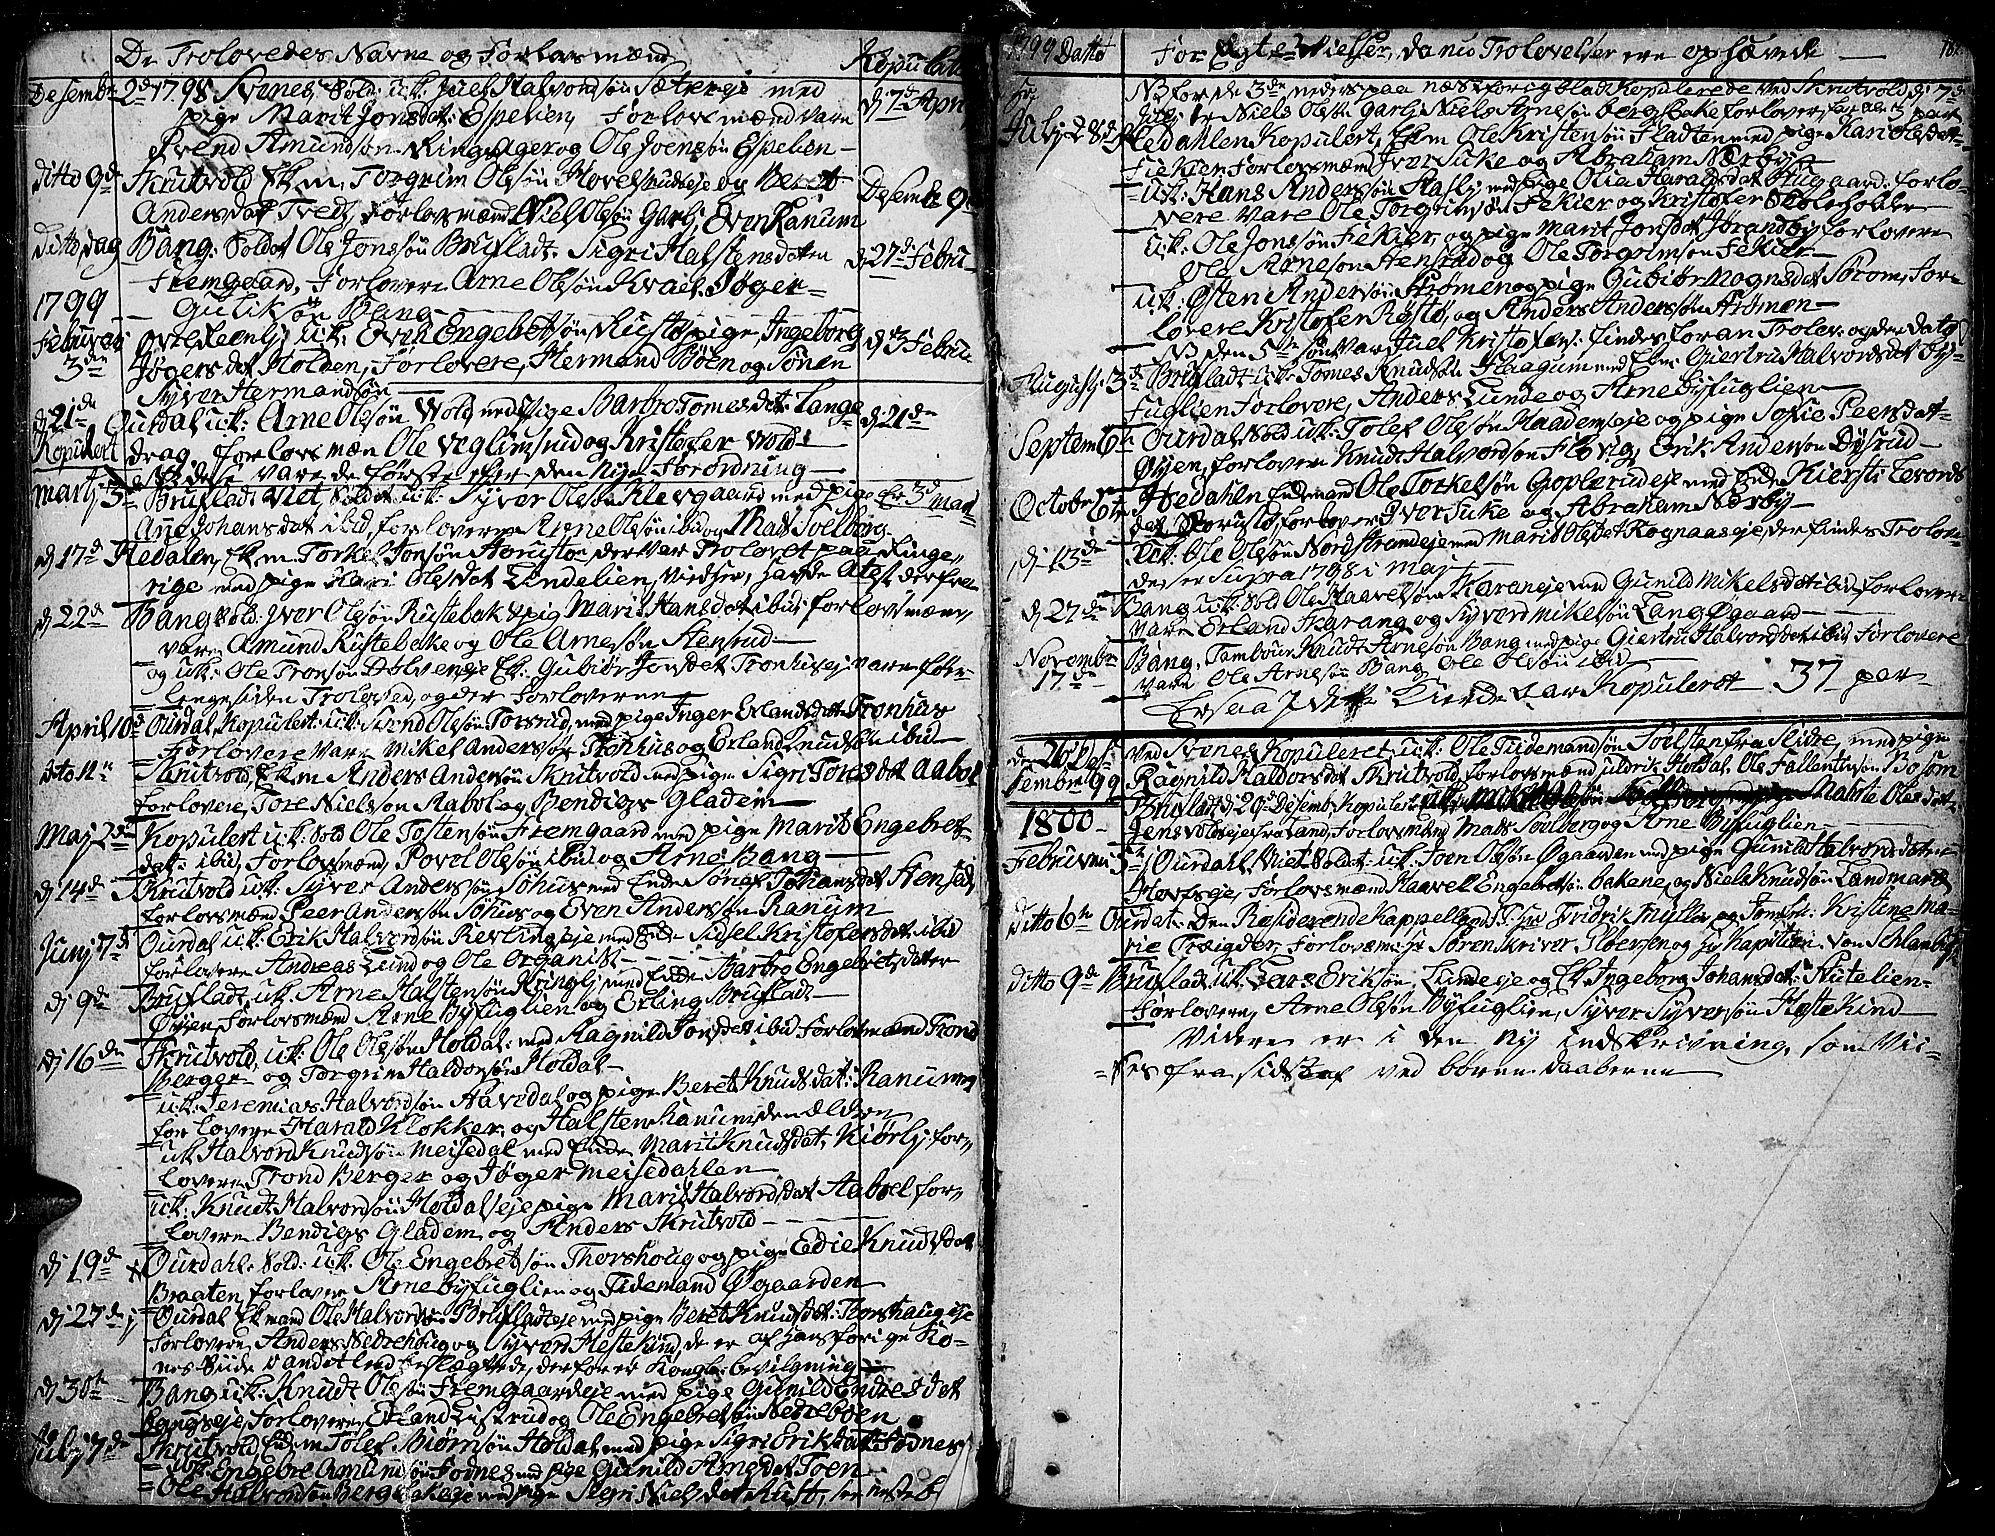 SAH, Aurdal prestekontor, Ministerialbok nr. 6, 1781-1804, s. 182